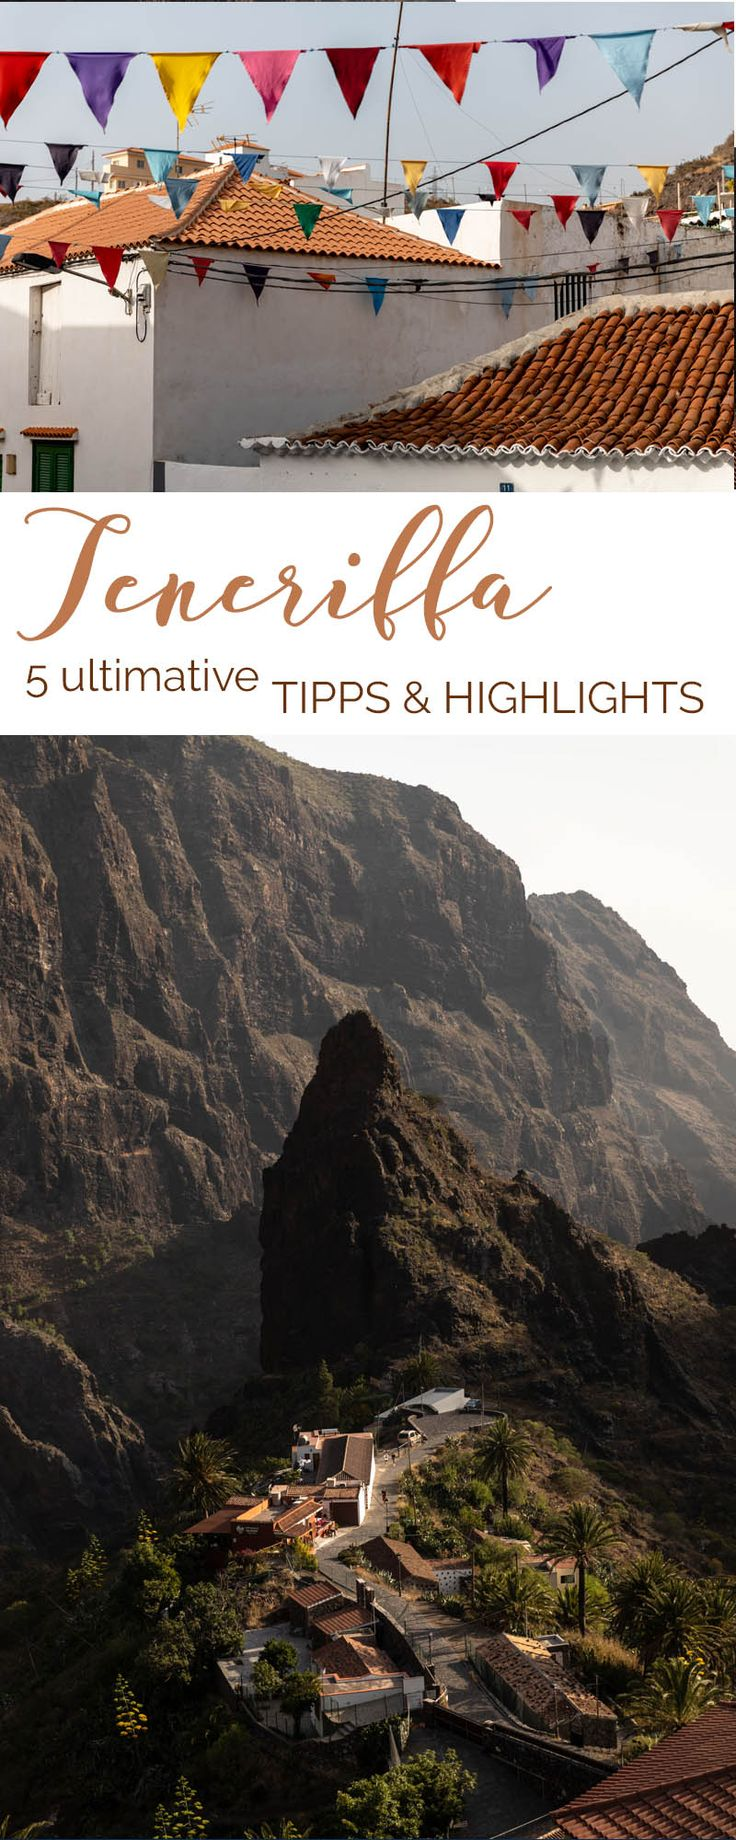 Teneriffa – 5 Highlights & Reisetipps – coloronagreyday